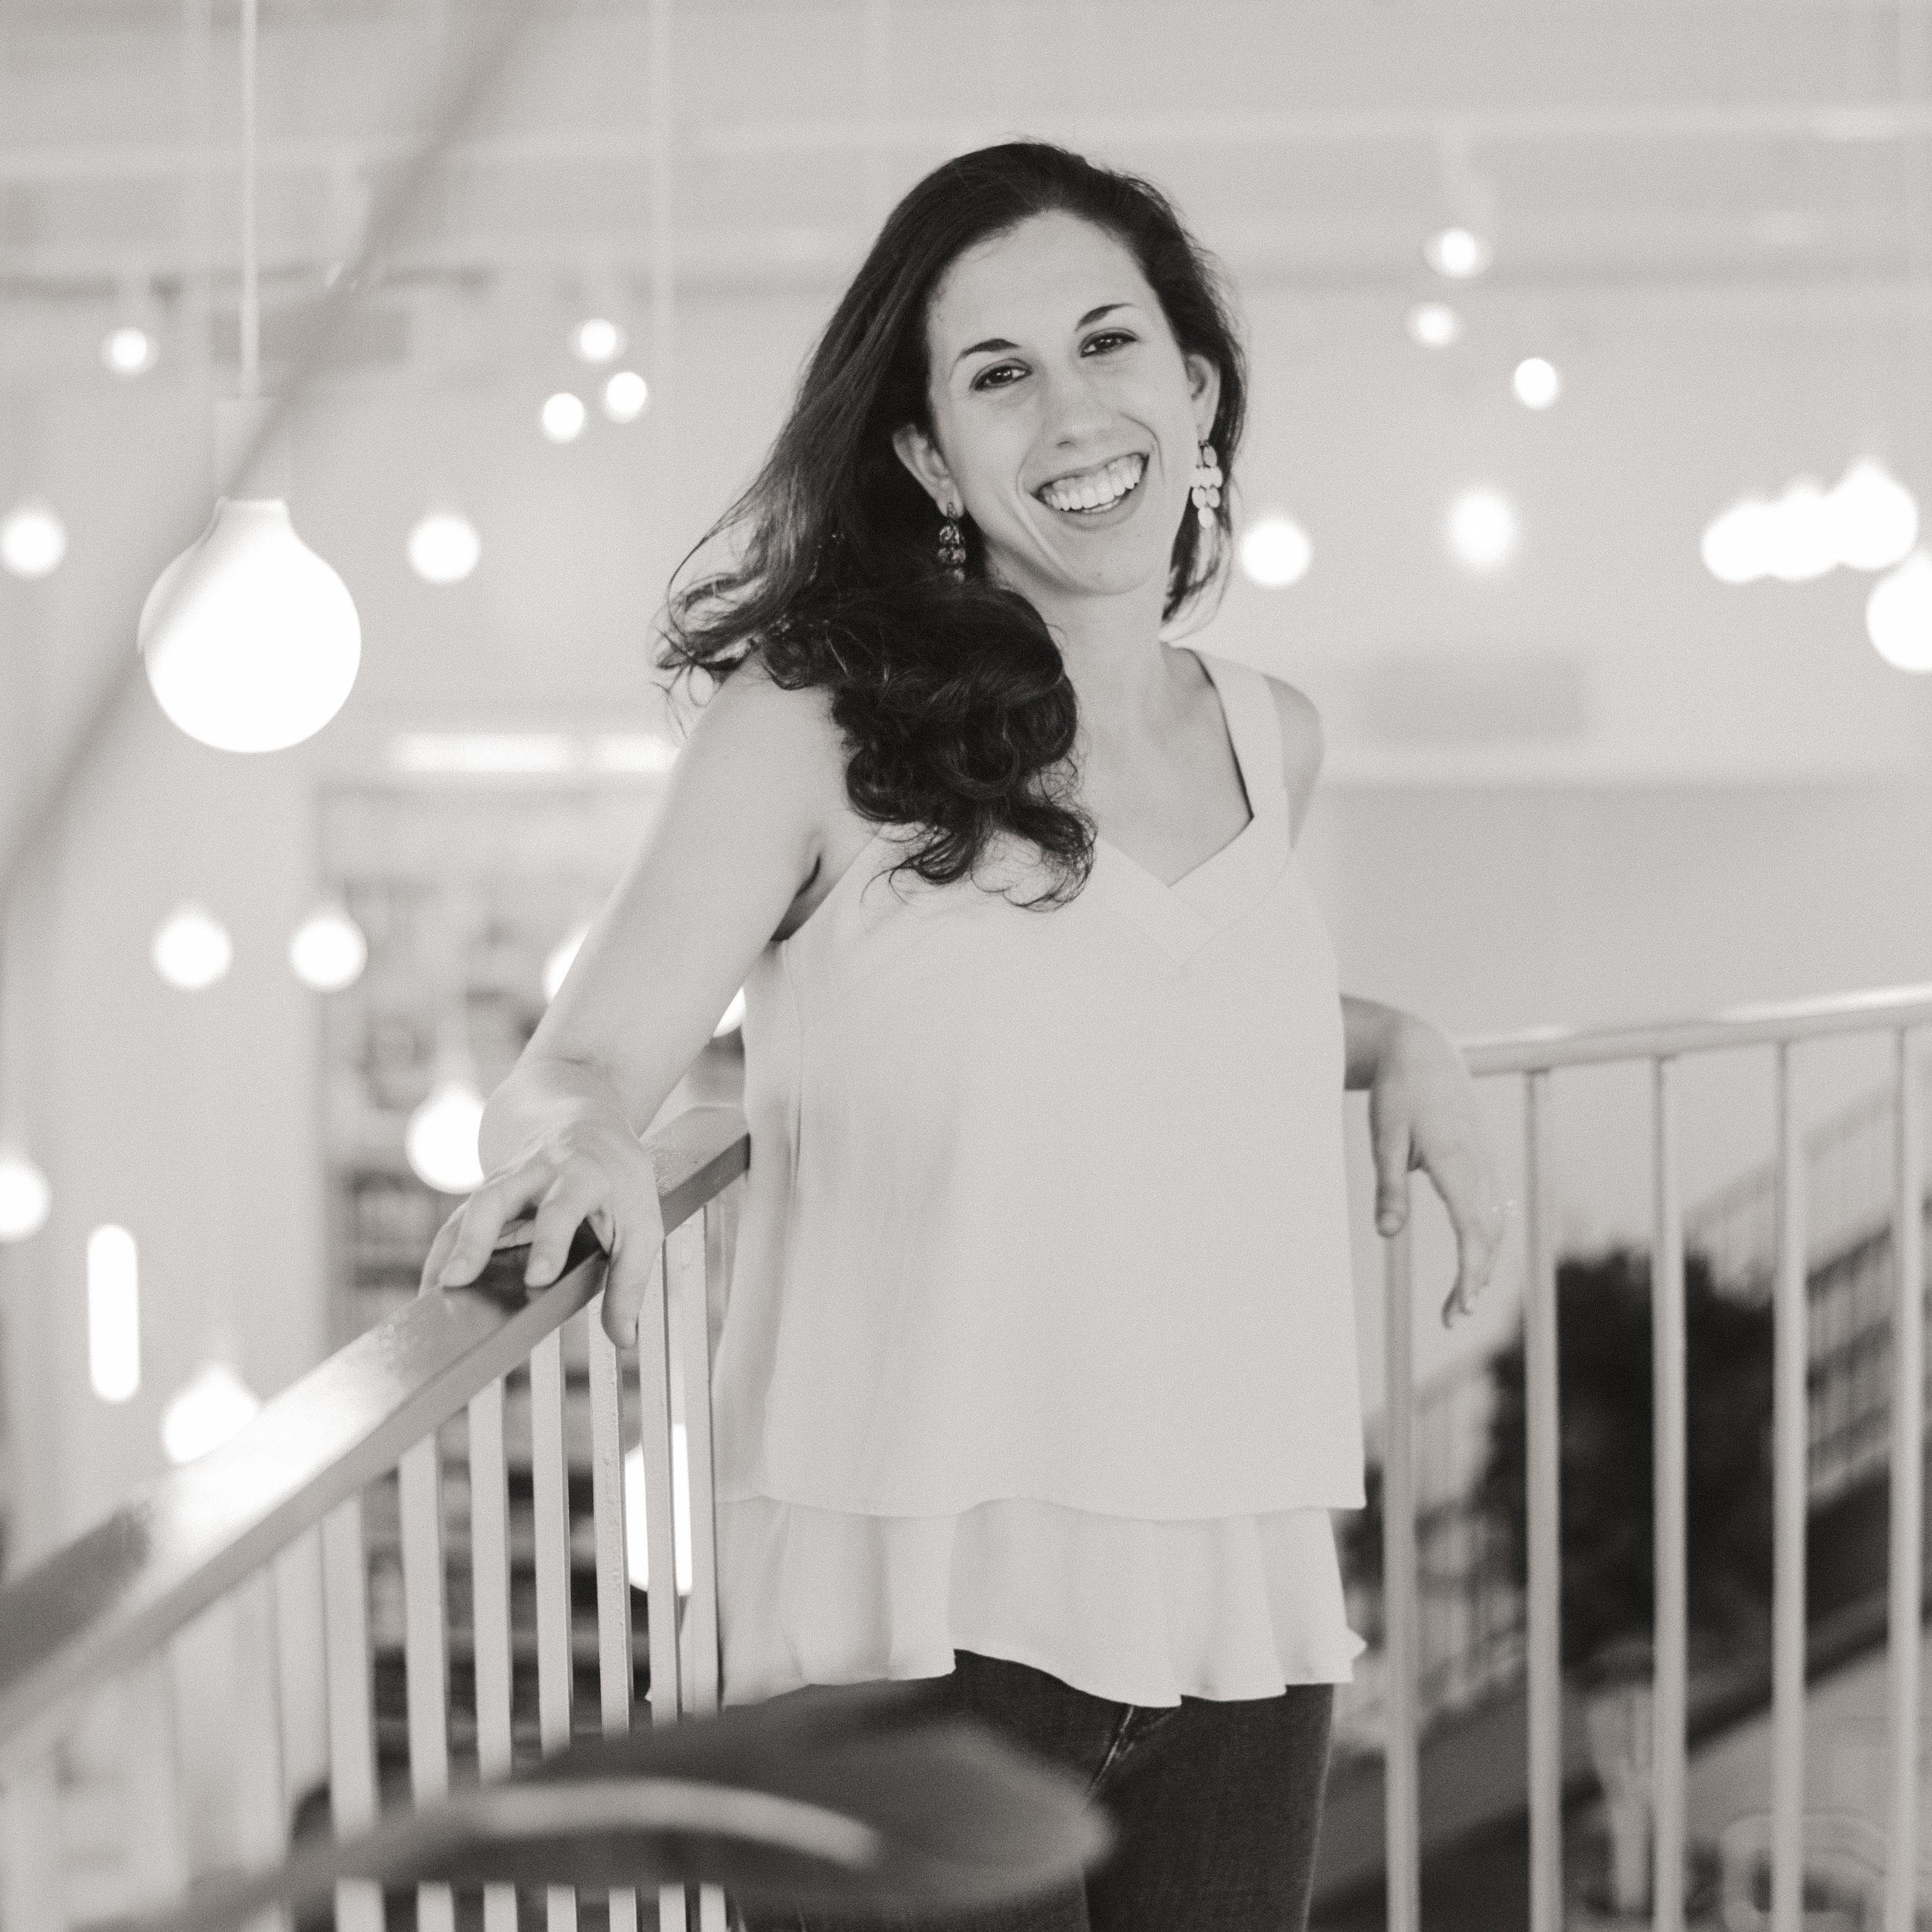 Stephanie-PhotobyBridgetBadore-8100+%281%29.jpg